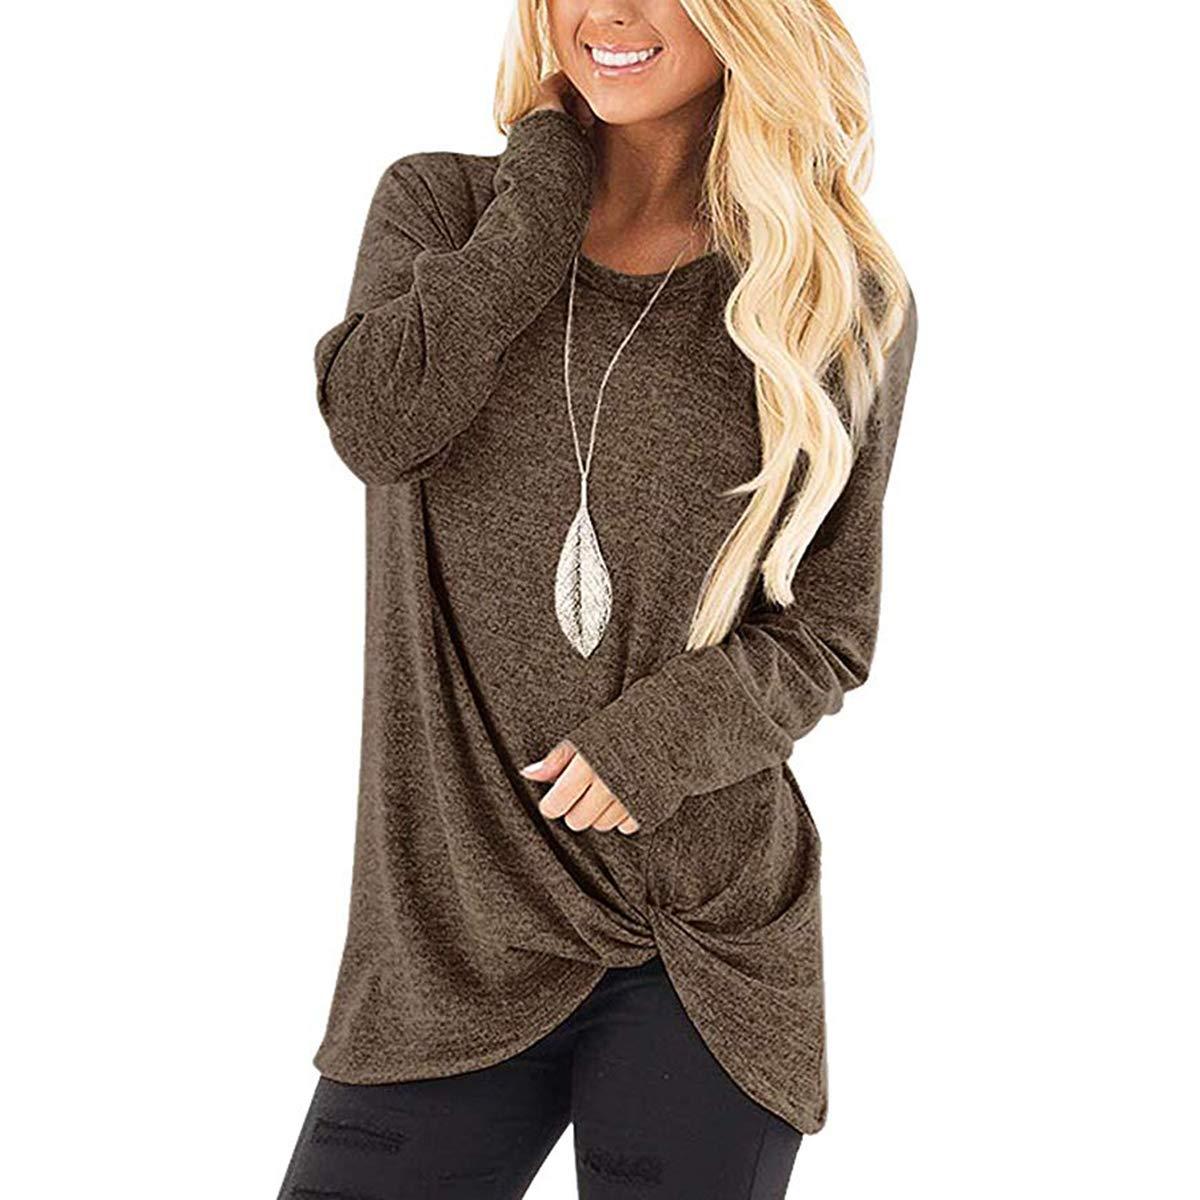 Brown Ilfioreemio Women Knit Tunic Top Round Neck Blouse Knot Twist Front Long Sleeve Casual Soft Sweatshirt